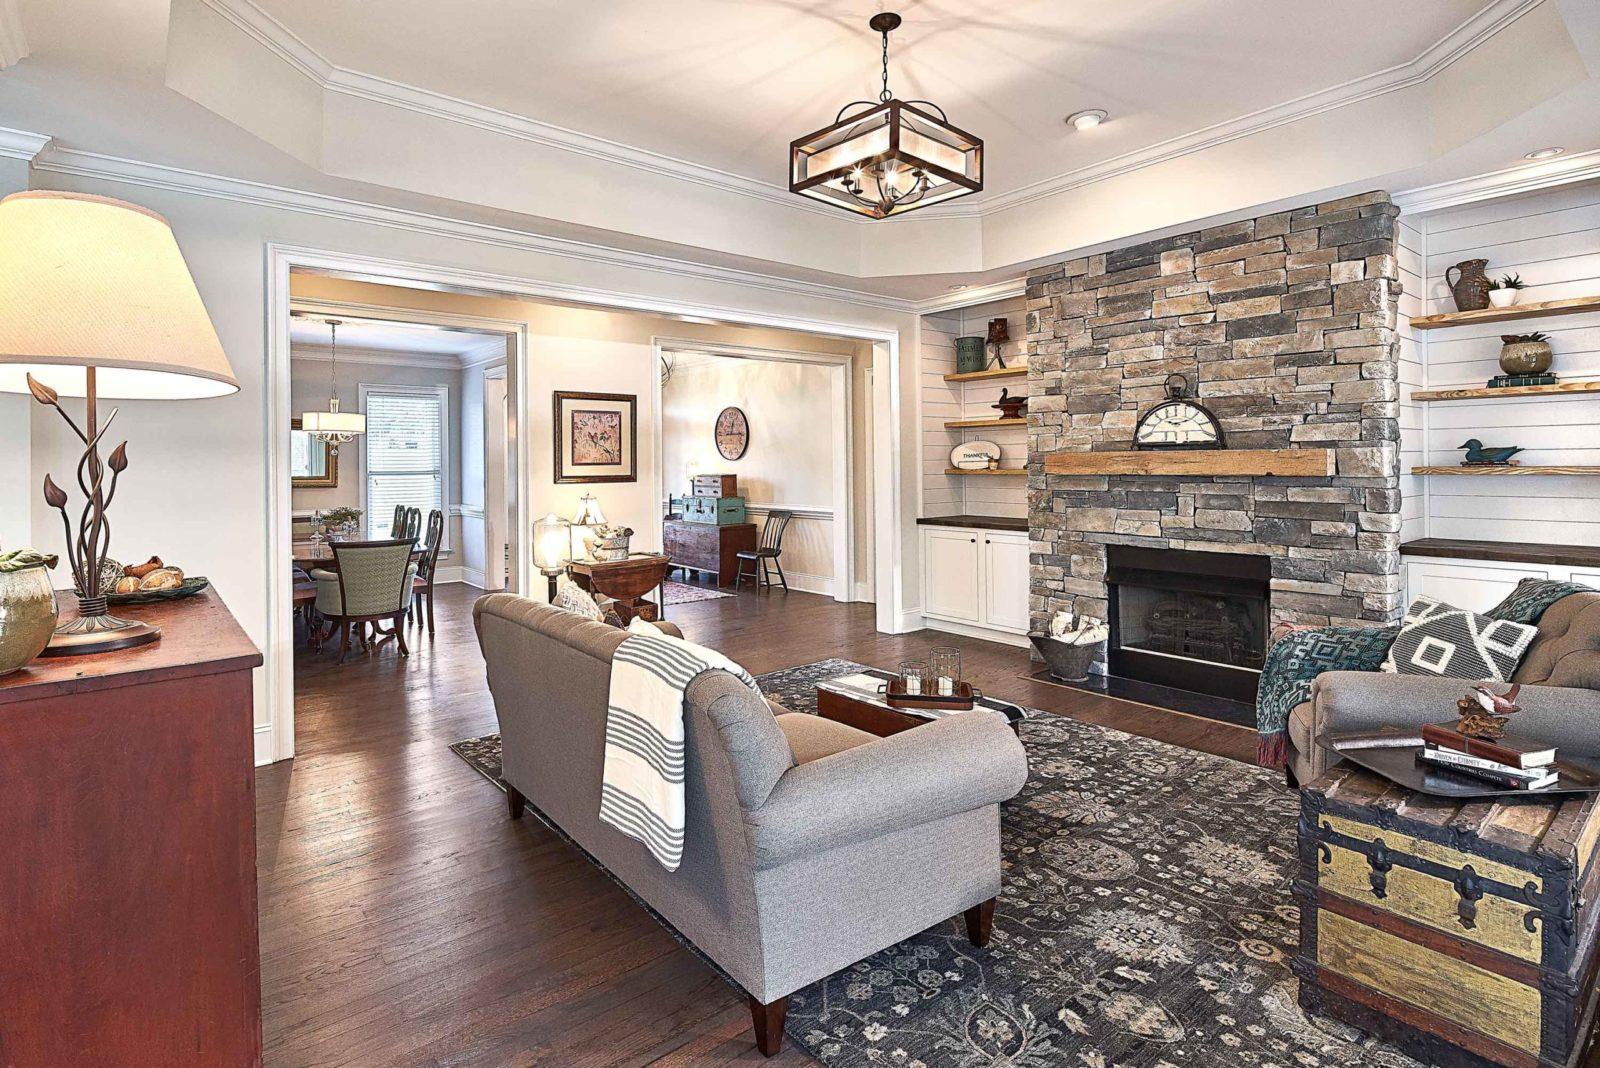 farmhouse-renovation-whole-home-renovation-mt-pleasant-nc